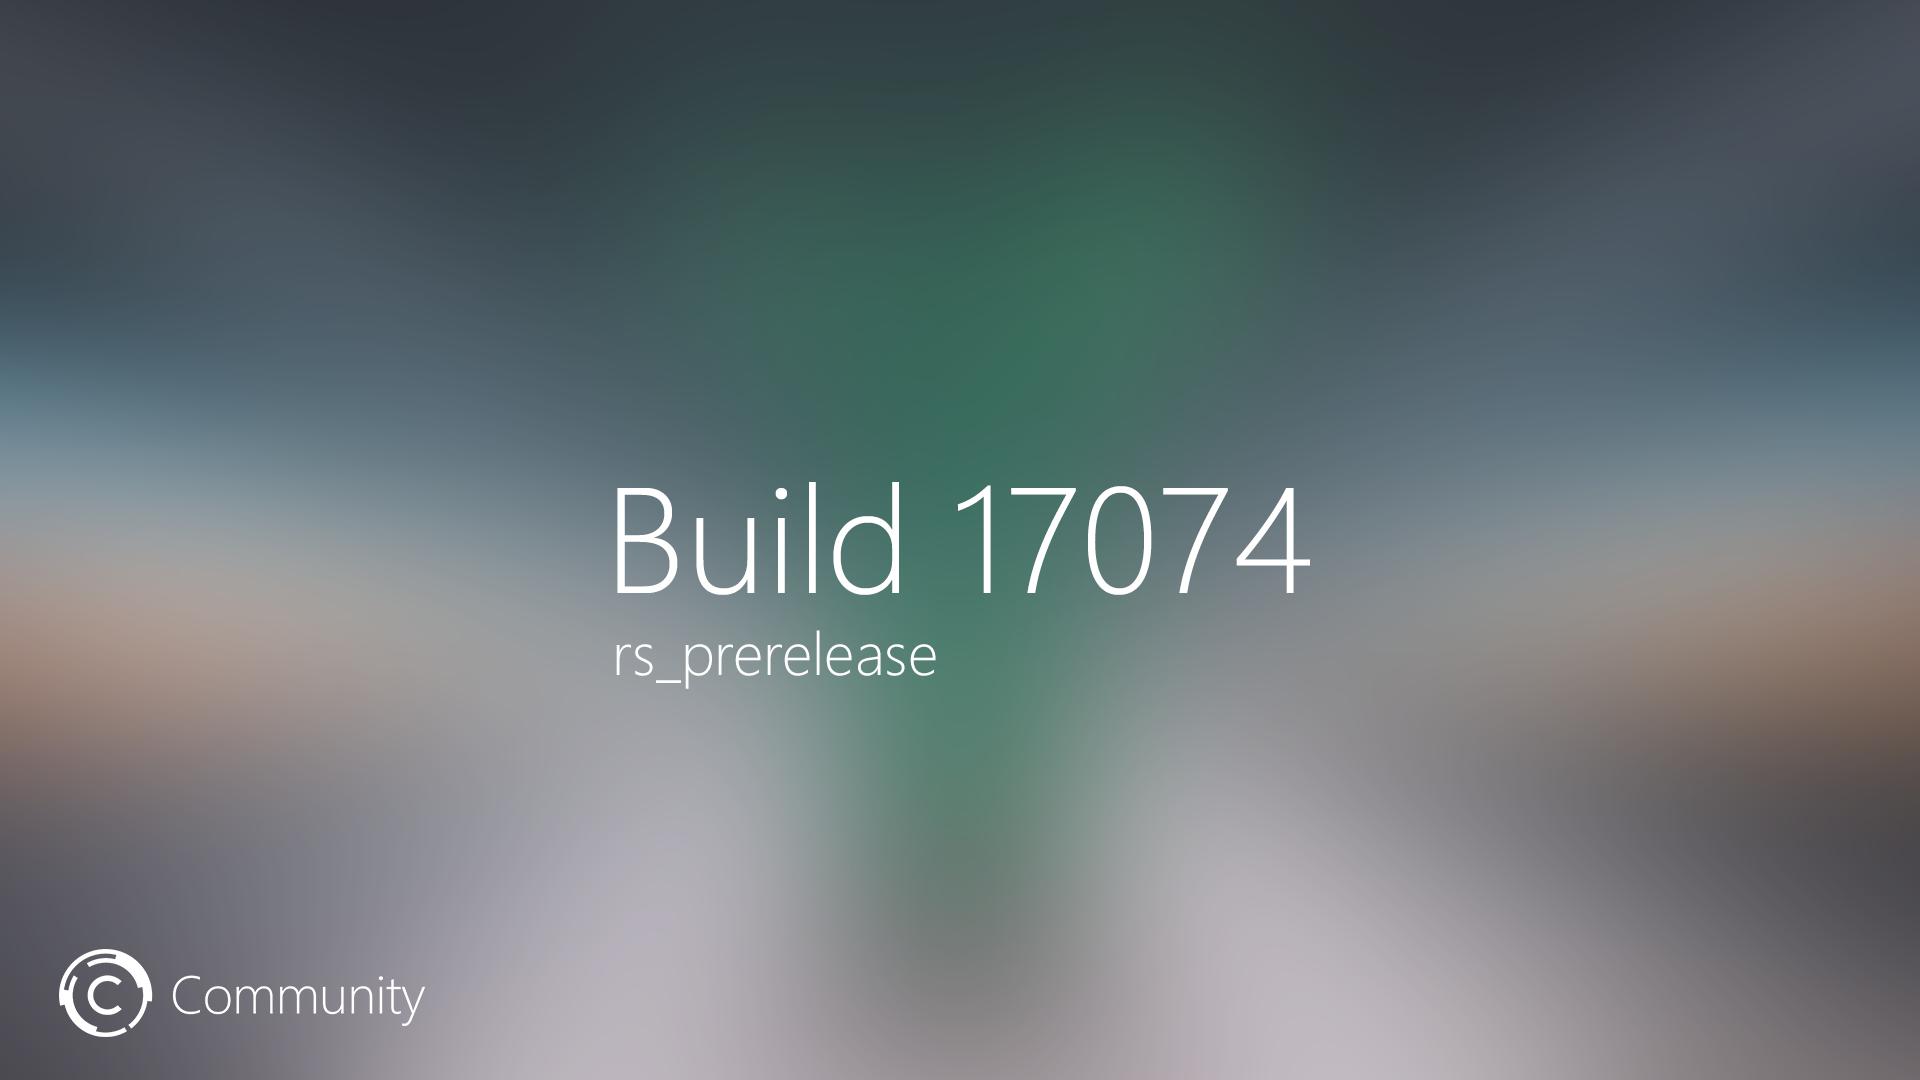 Анонс Windows 10 Insider Preview Build 17074 для ПК